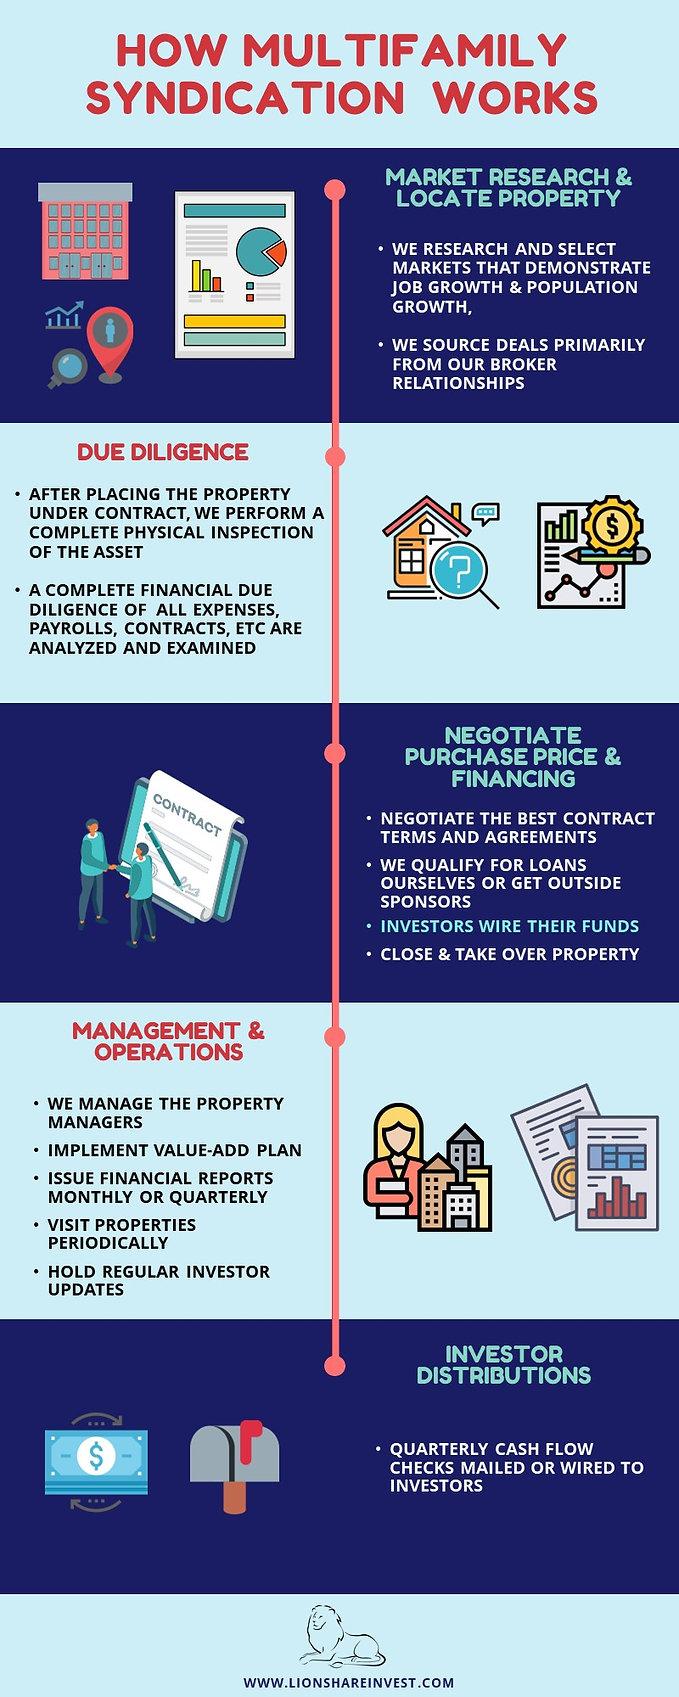 Research Market & Locate Property.jpg